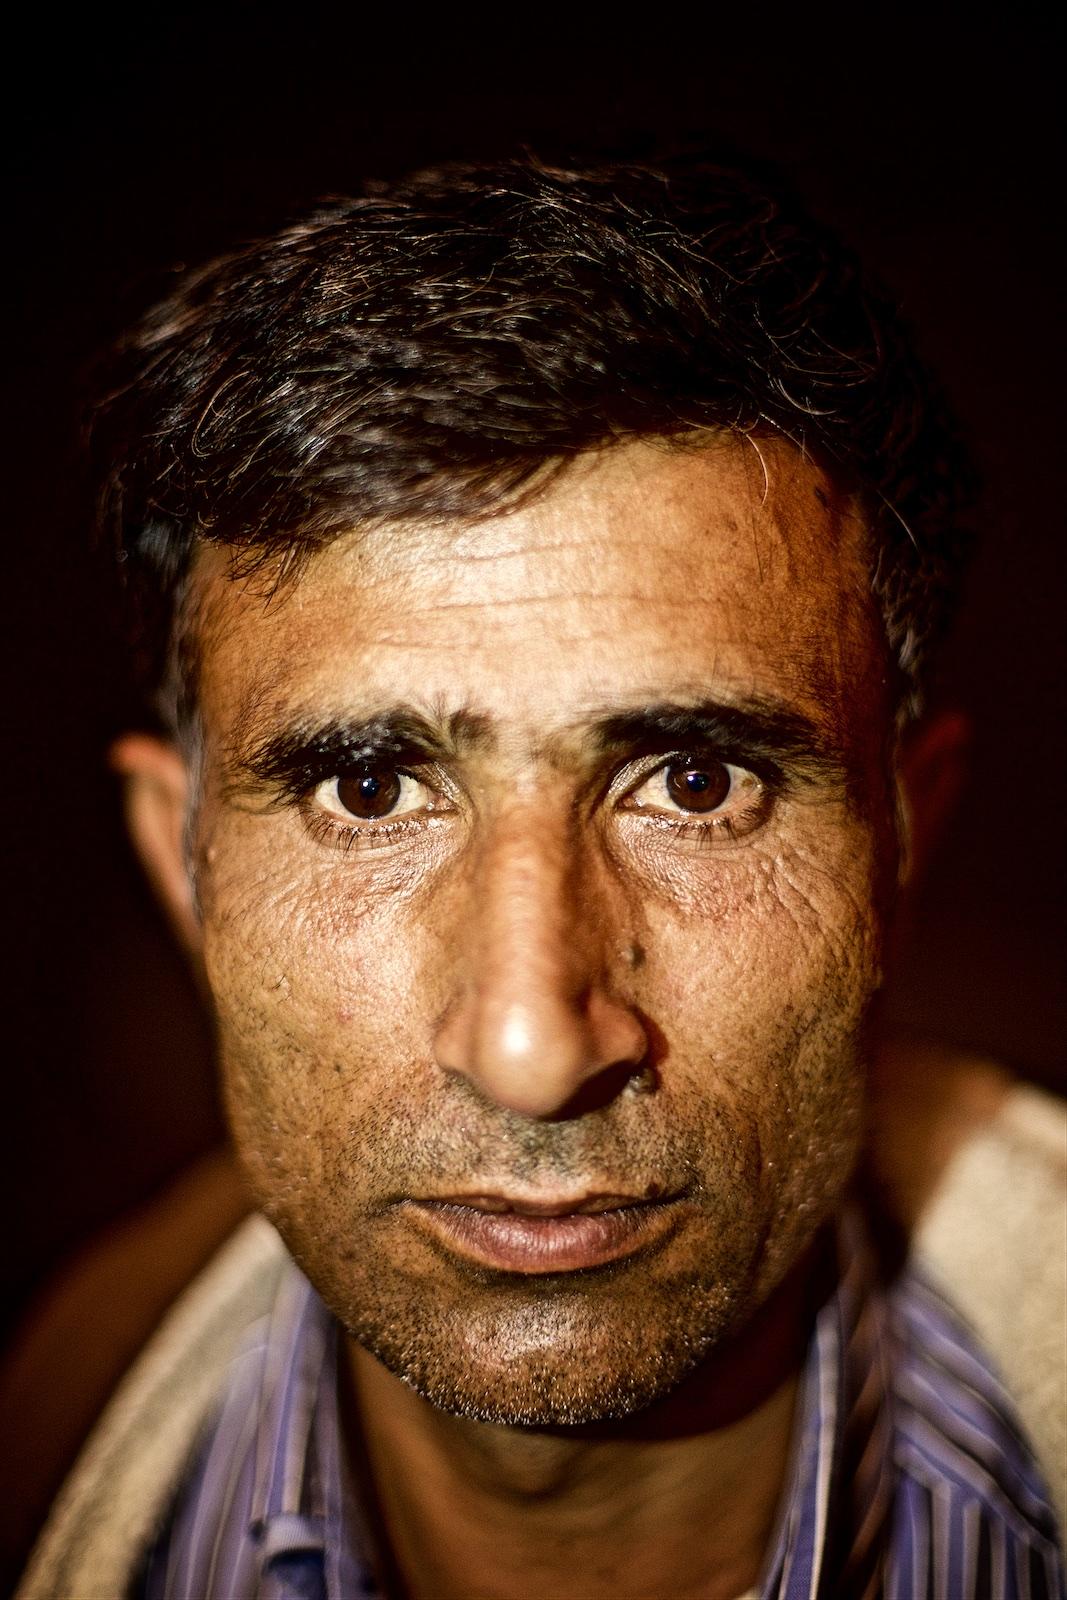 permanently-temporary-refugees-italy-rifugiati-italia-denis-bosnic-photography-portraits-5 (1).jpg